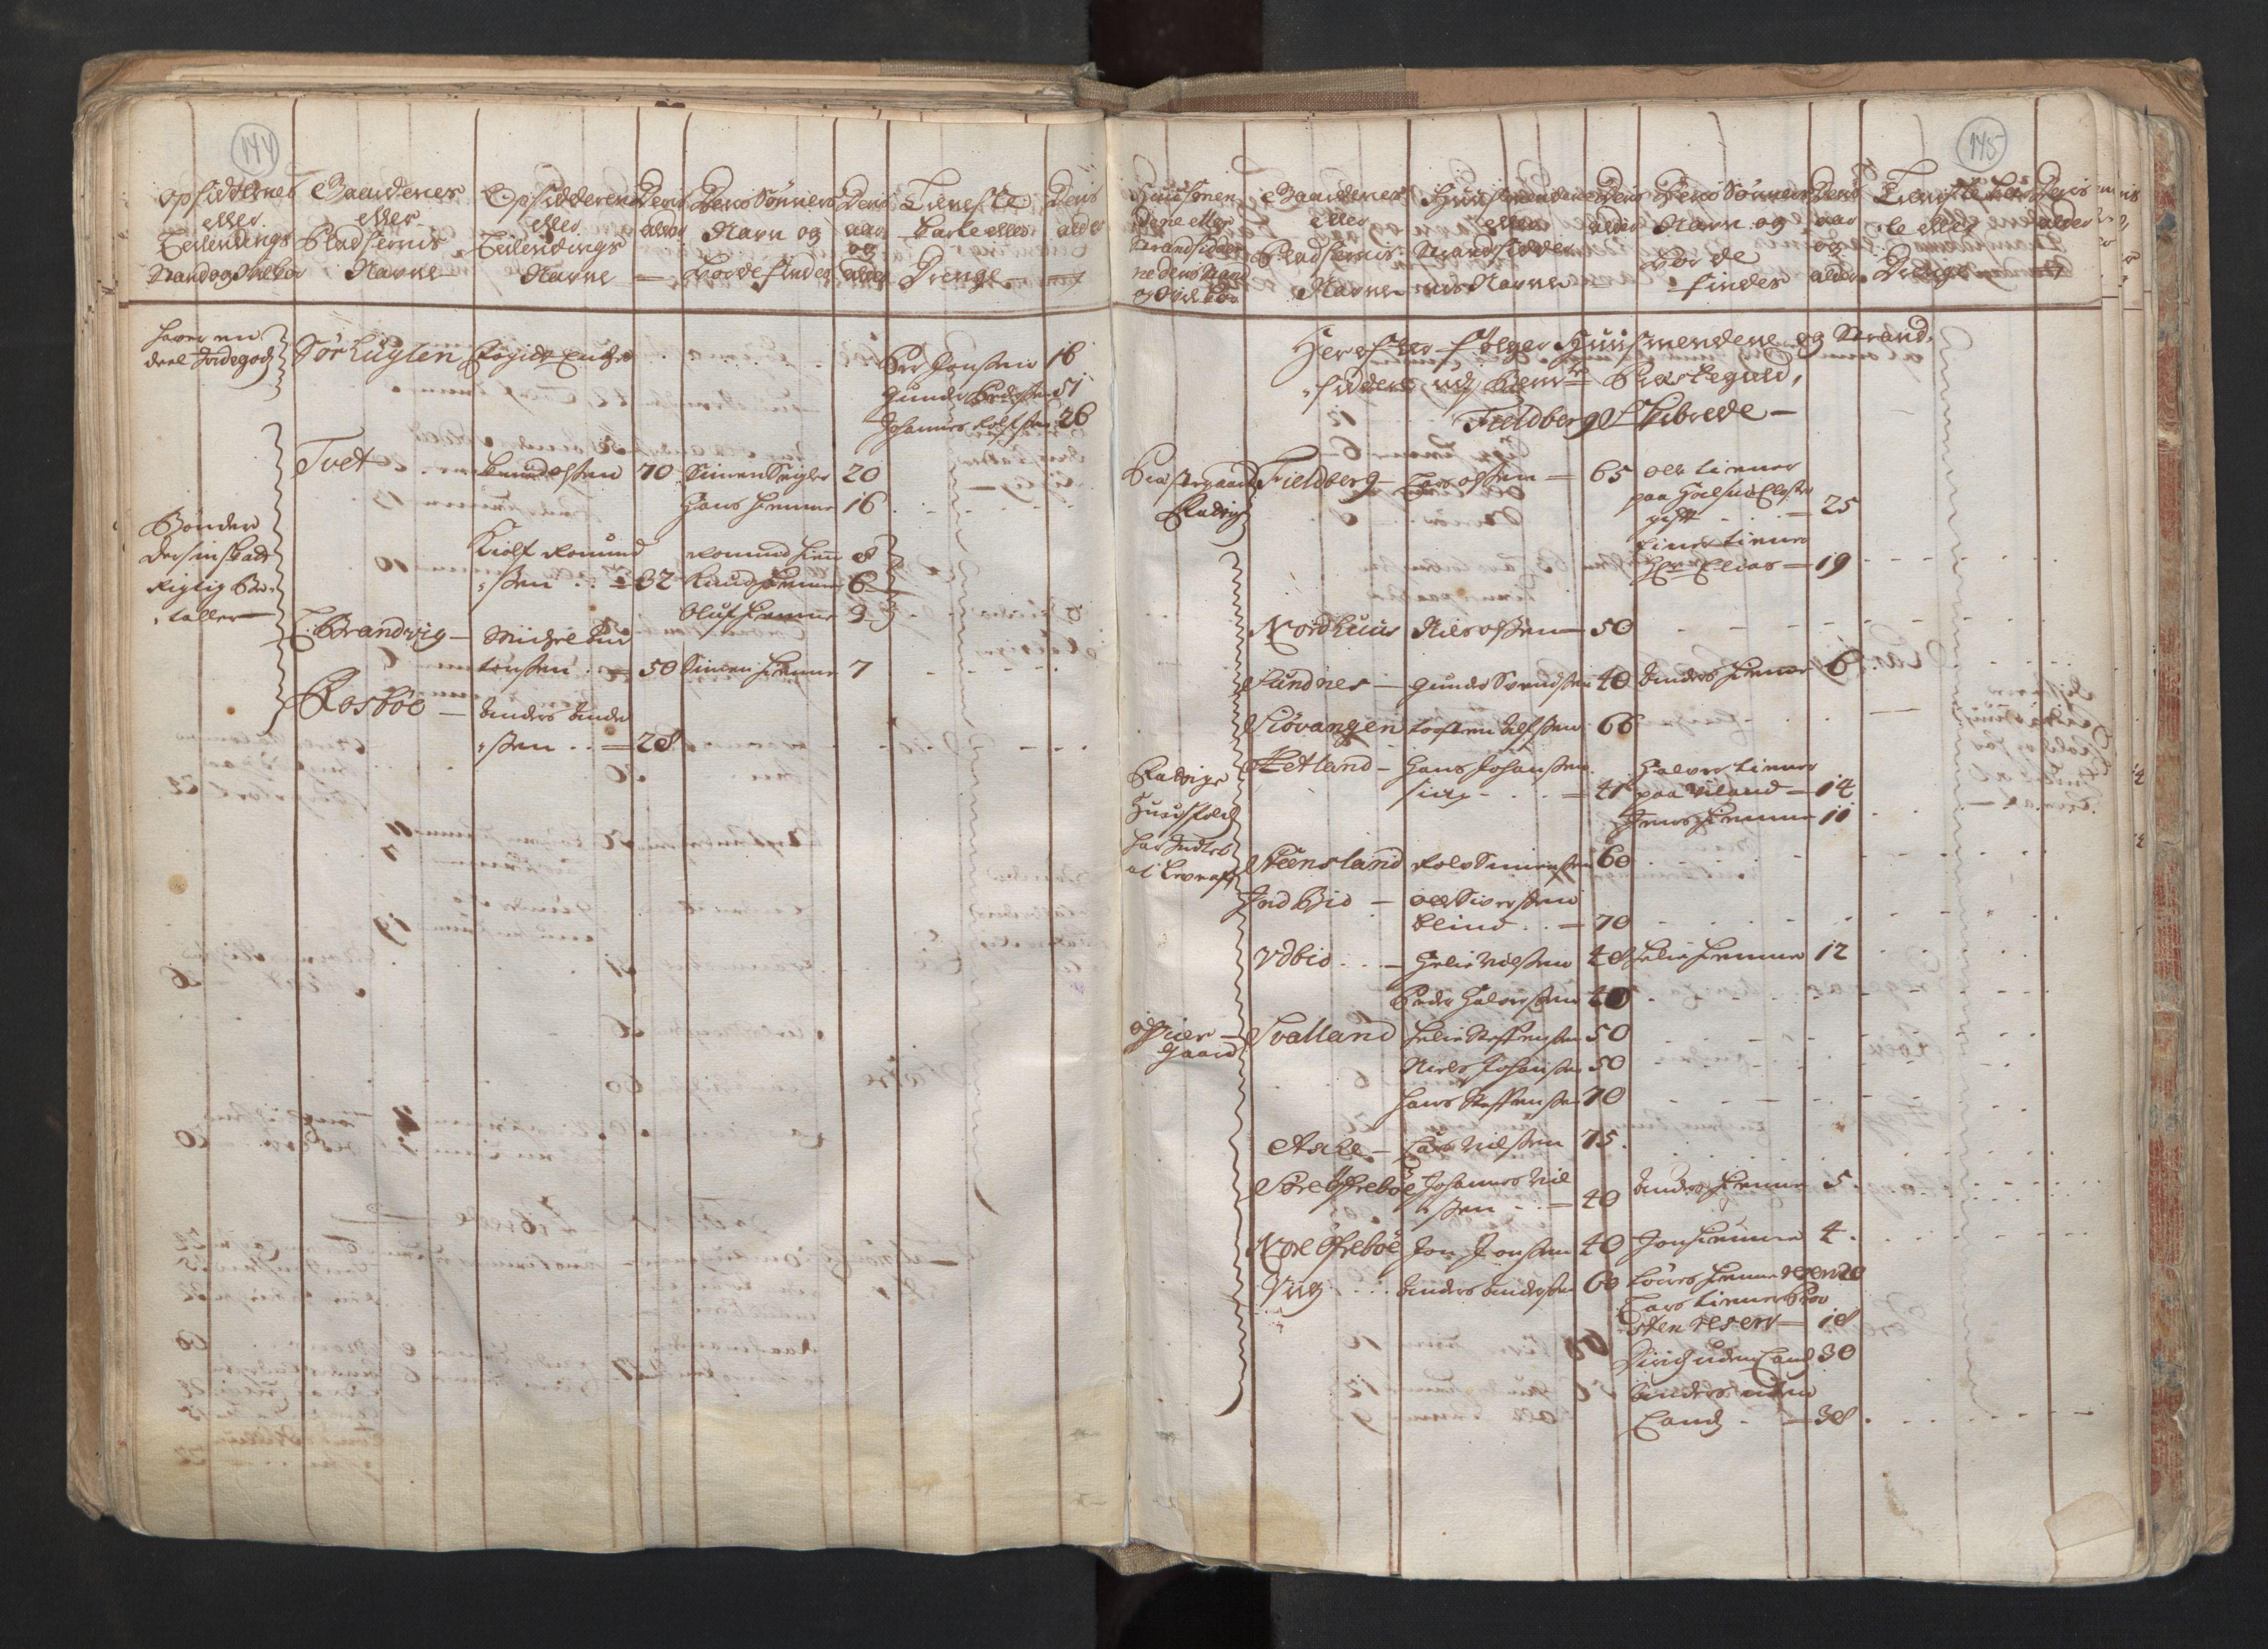 RA, Manntallet 1701, nr. 6: Sunnhordland fogderi og Hardanger fogderi, 1701, s. 144-145